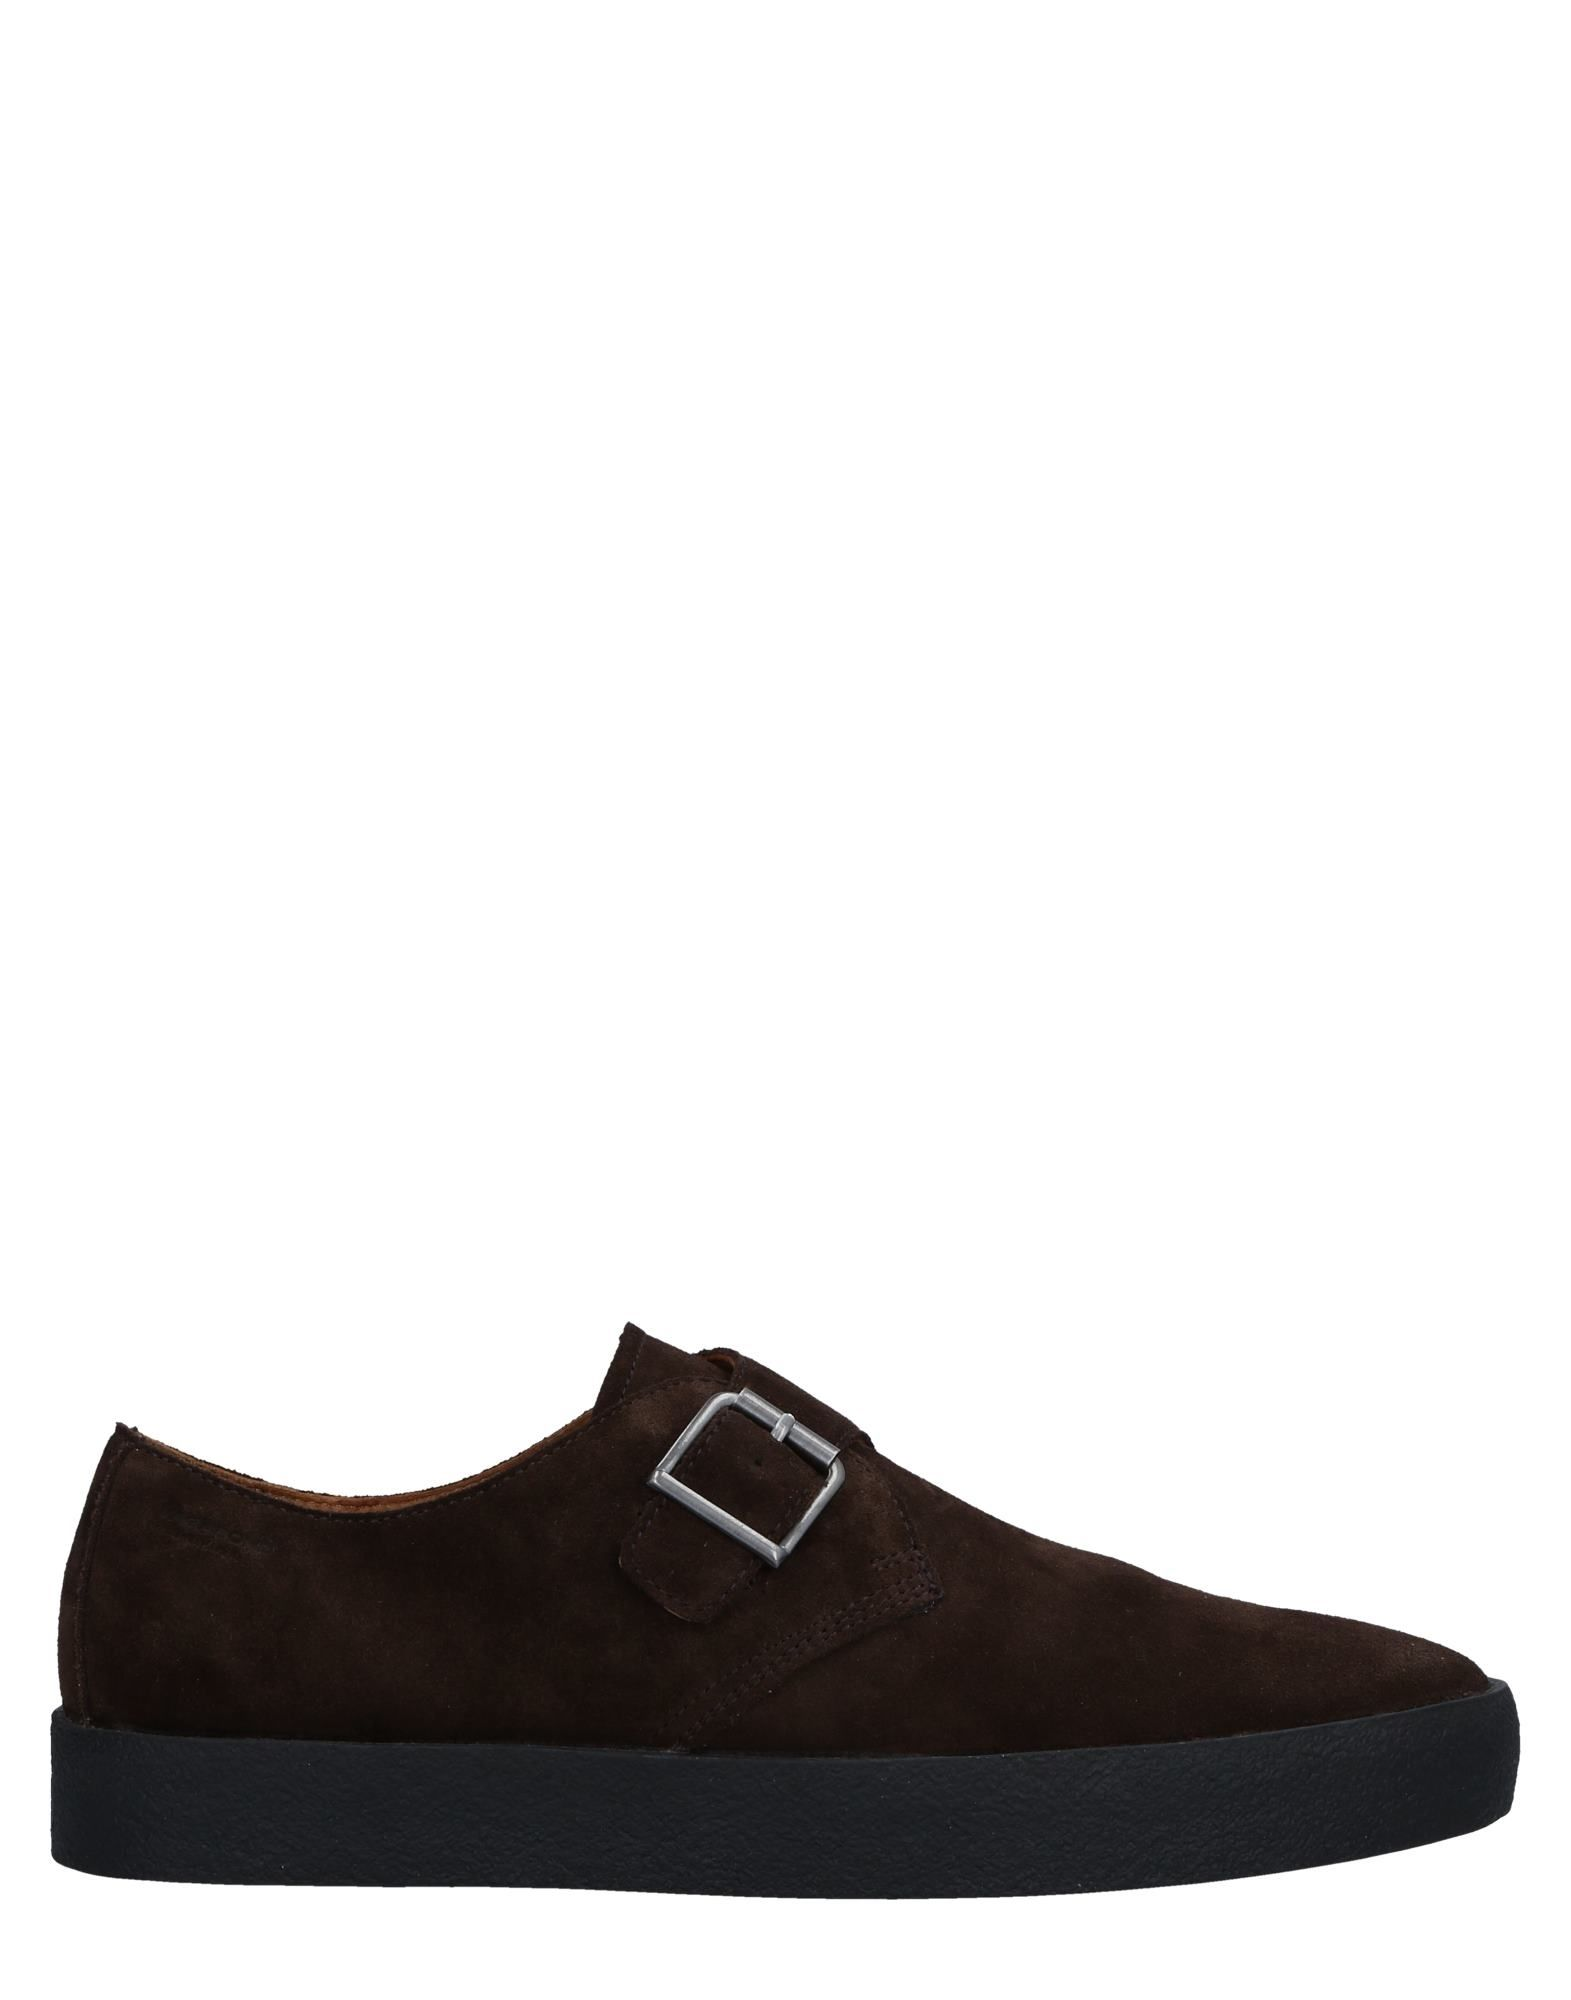 Vagabond Shoemakers Mokassins Herren  11516887LF Gute Qualität beliebte Schuhe